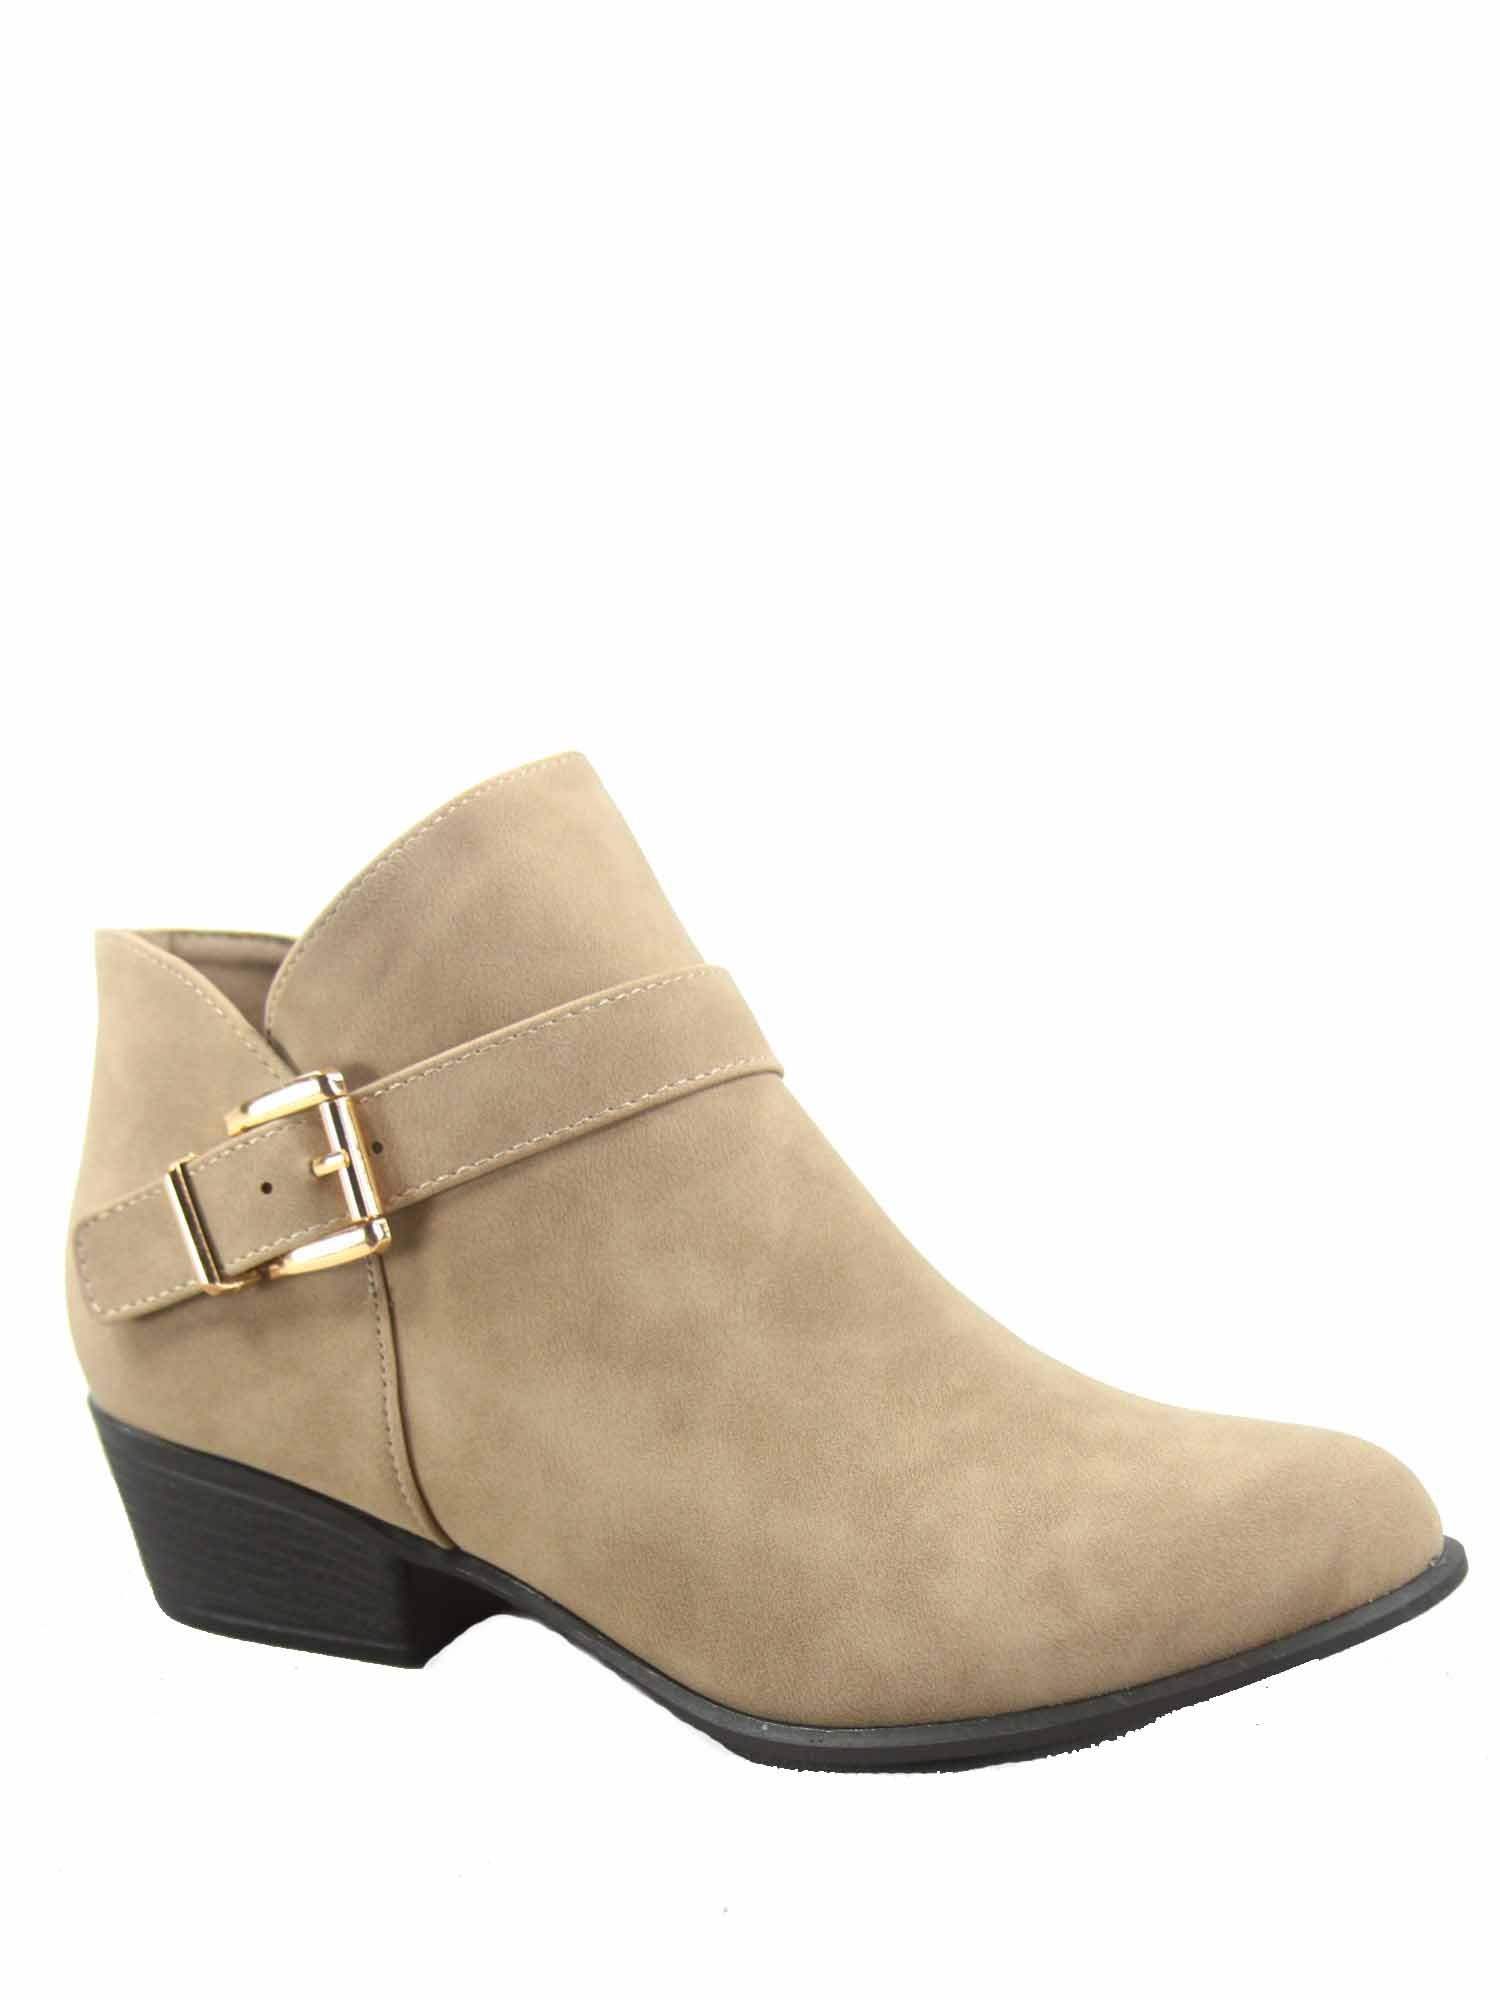 Top Moda Gary-10 Women's Fashion Low Heel Side Zipper Ankle Western Booties Shoes (9 B(M) US, Khaki)